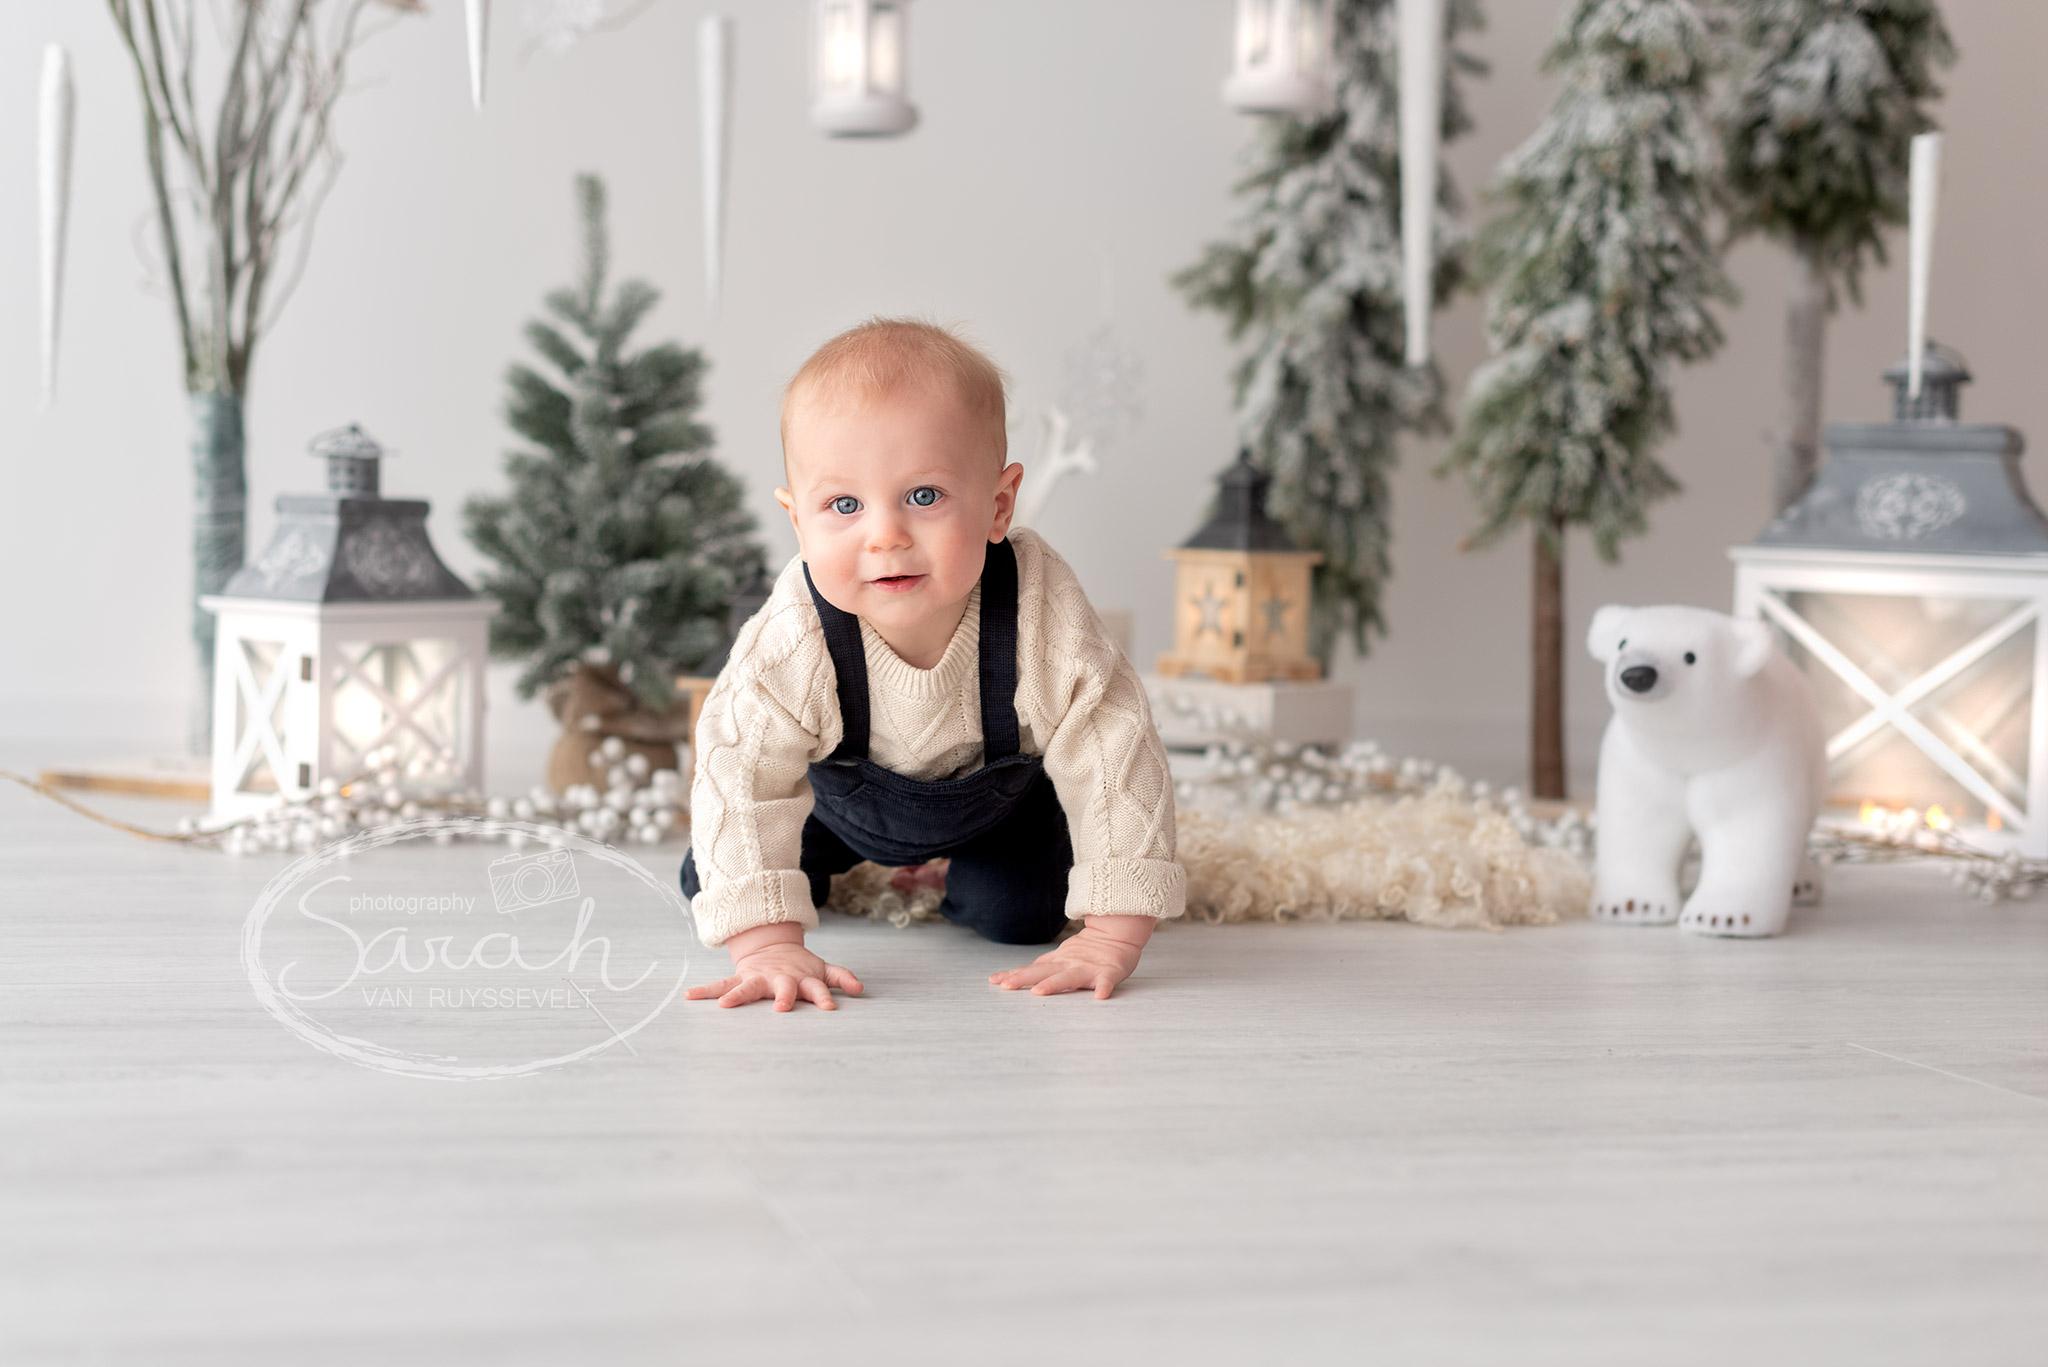 mini winter fotosessie, babyfotografie, 10 maanden baby, winterfotosessie, kinderfotografie, babyphotography, Sarah Van Ruyssevelt Photography